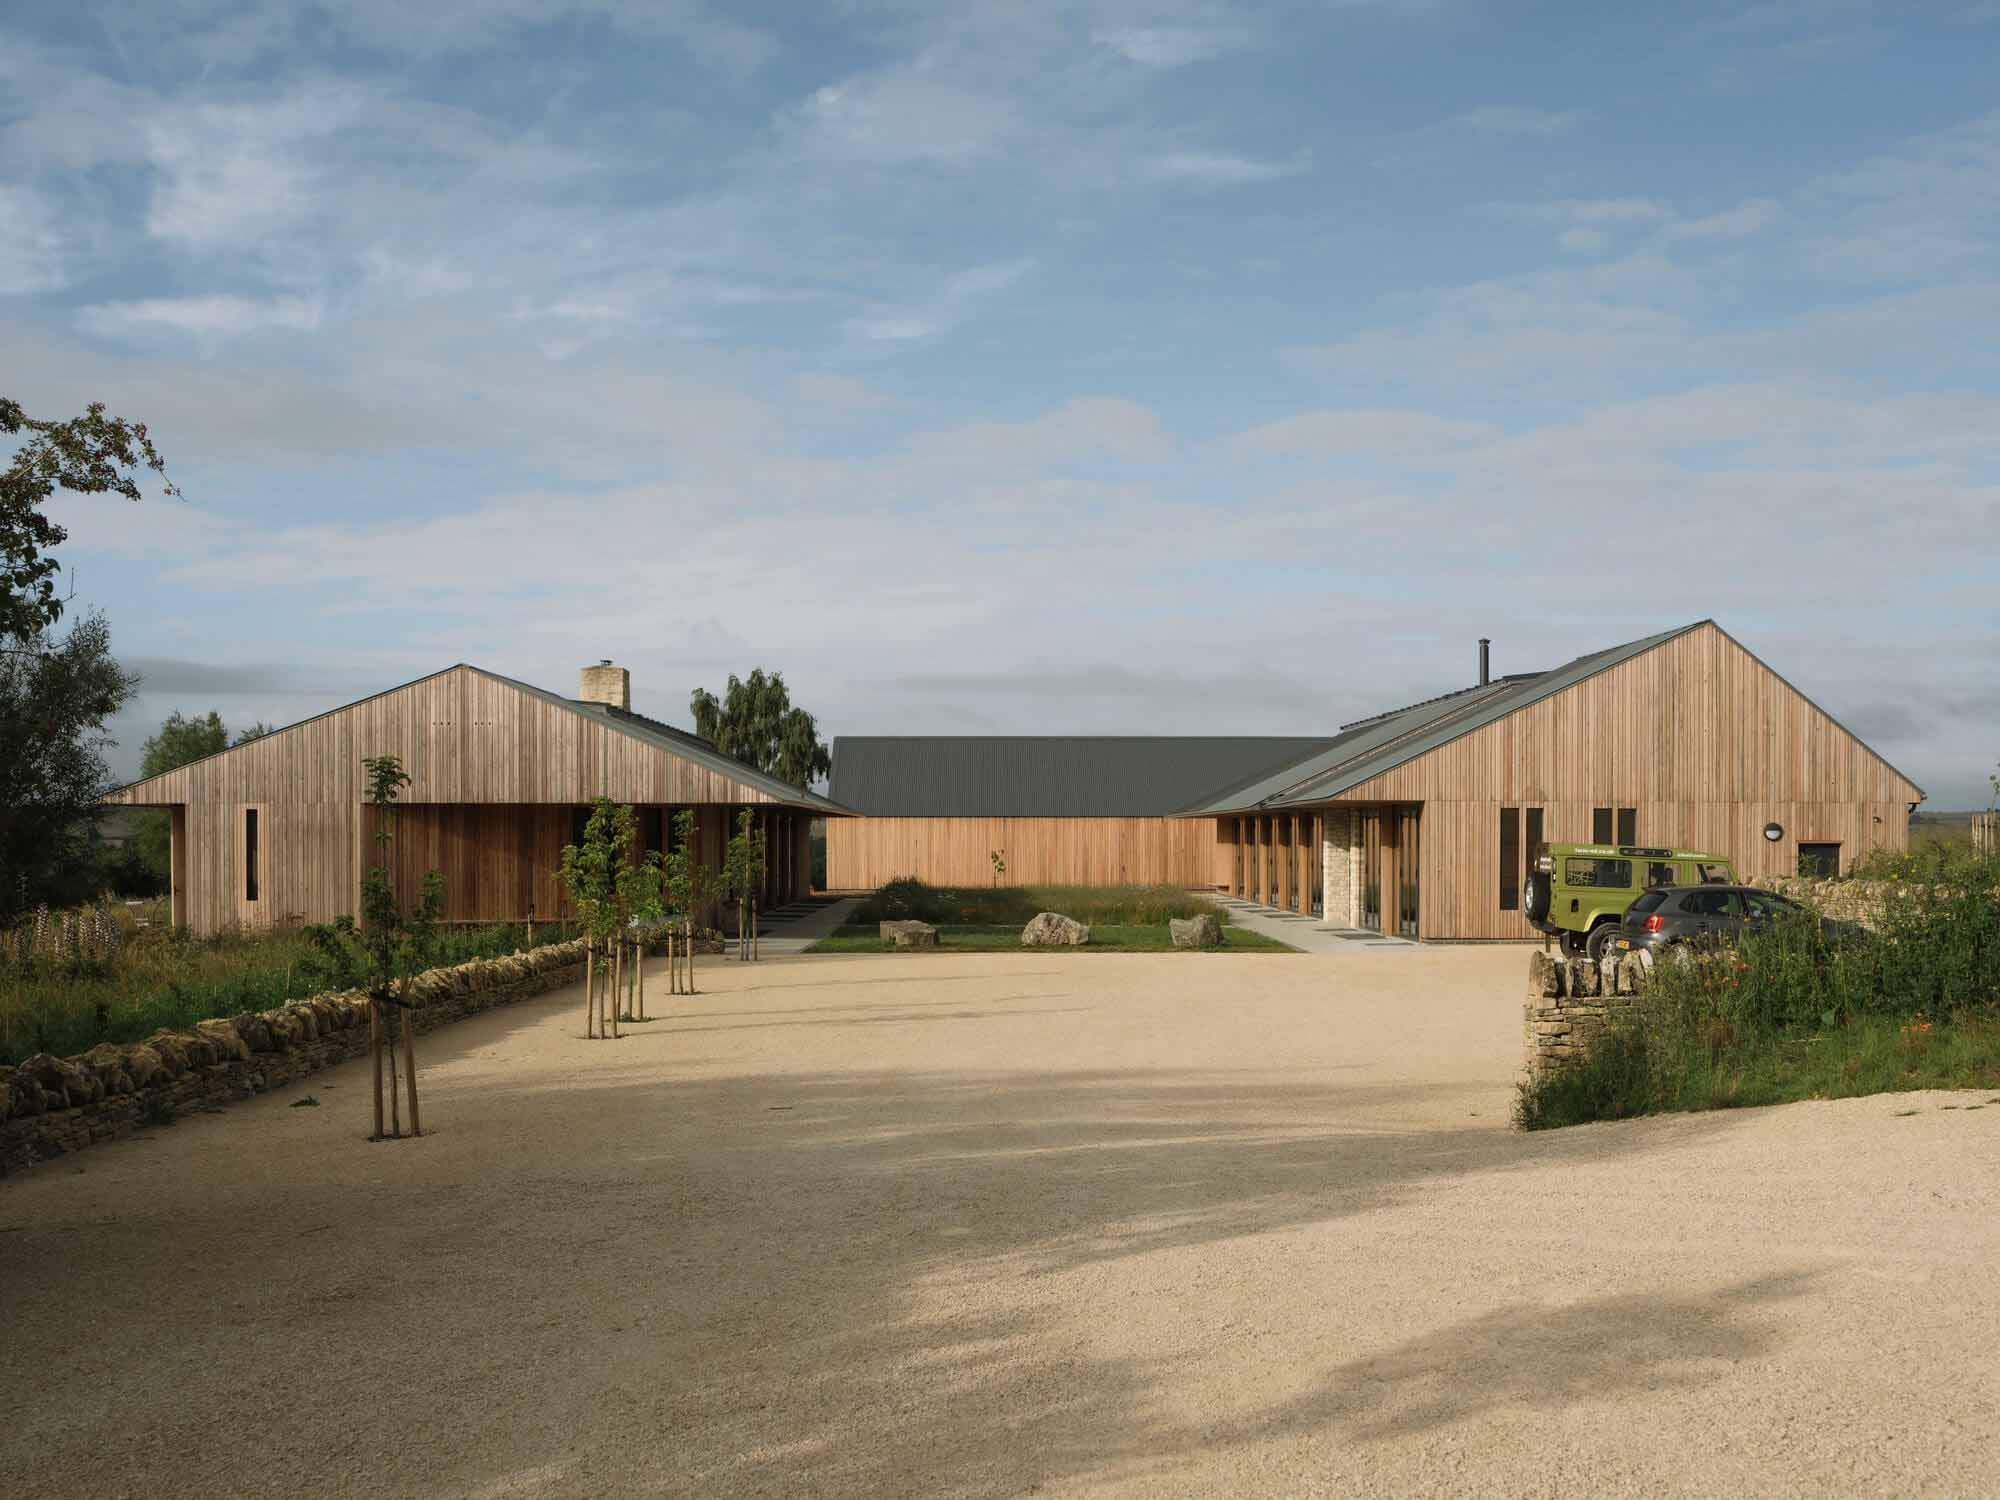 Образовательный центр FarmED / Timothy Tasker Architects